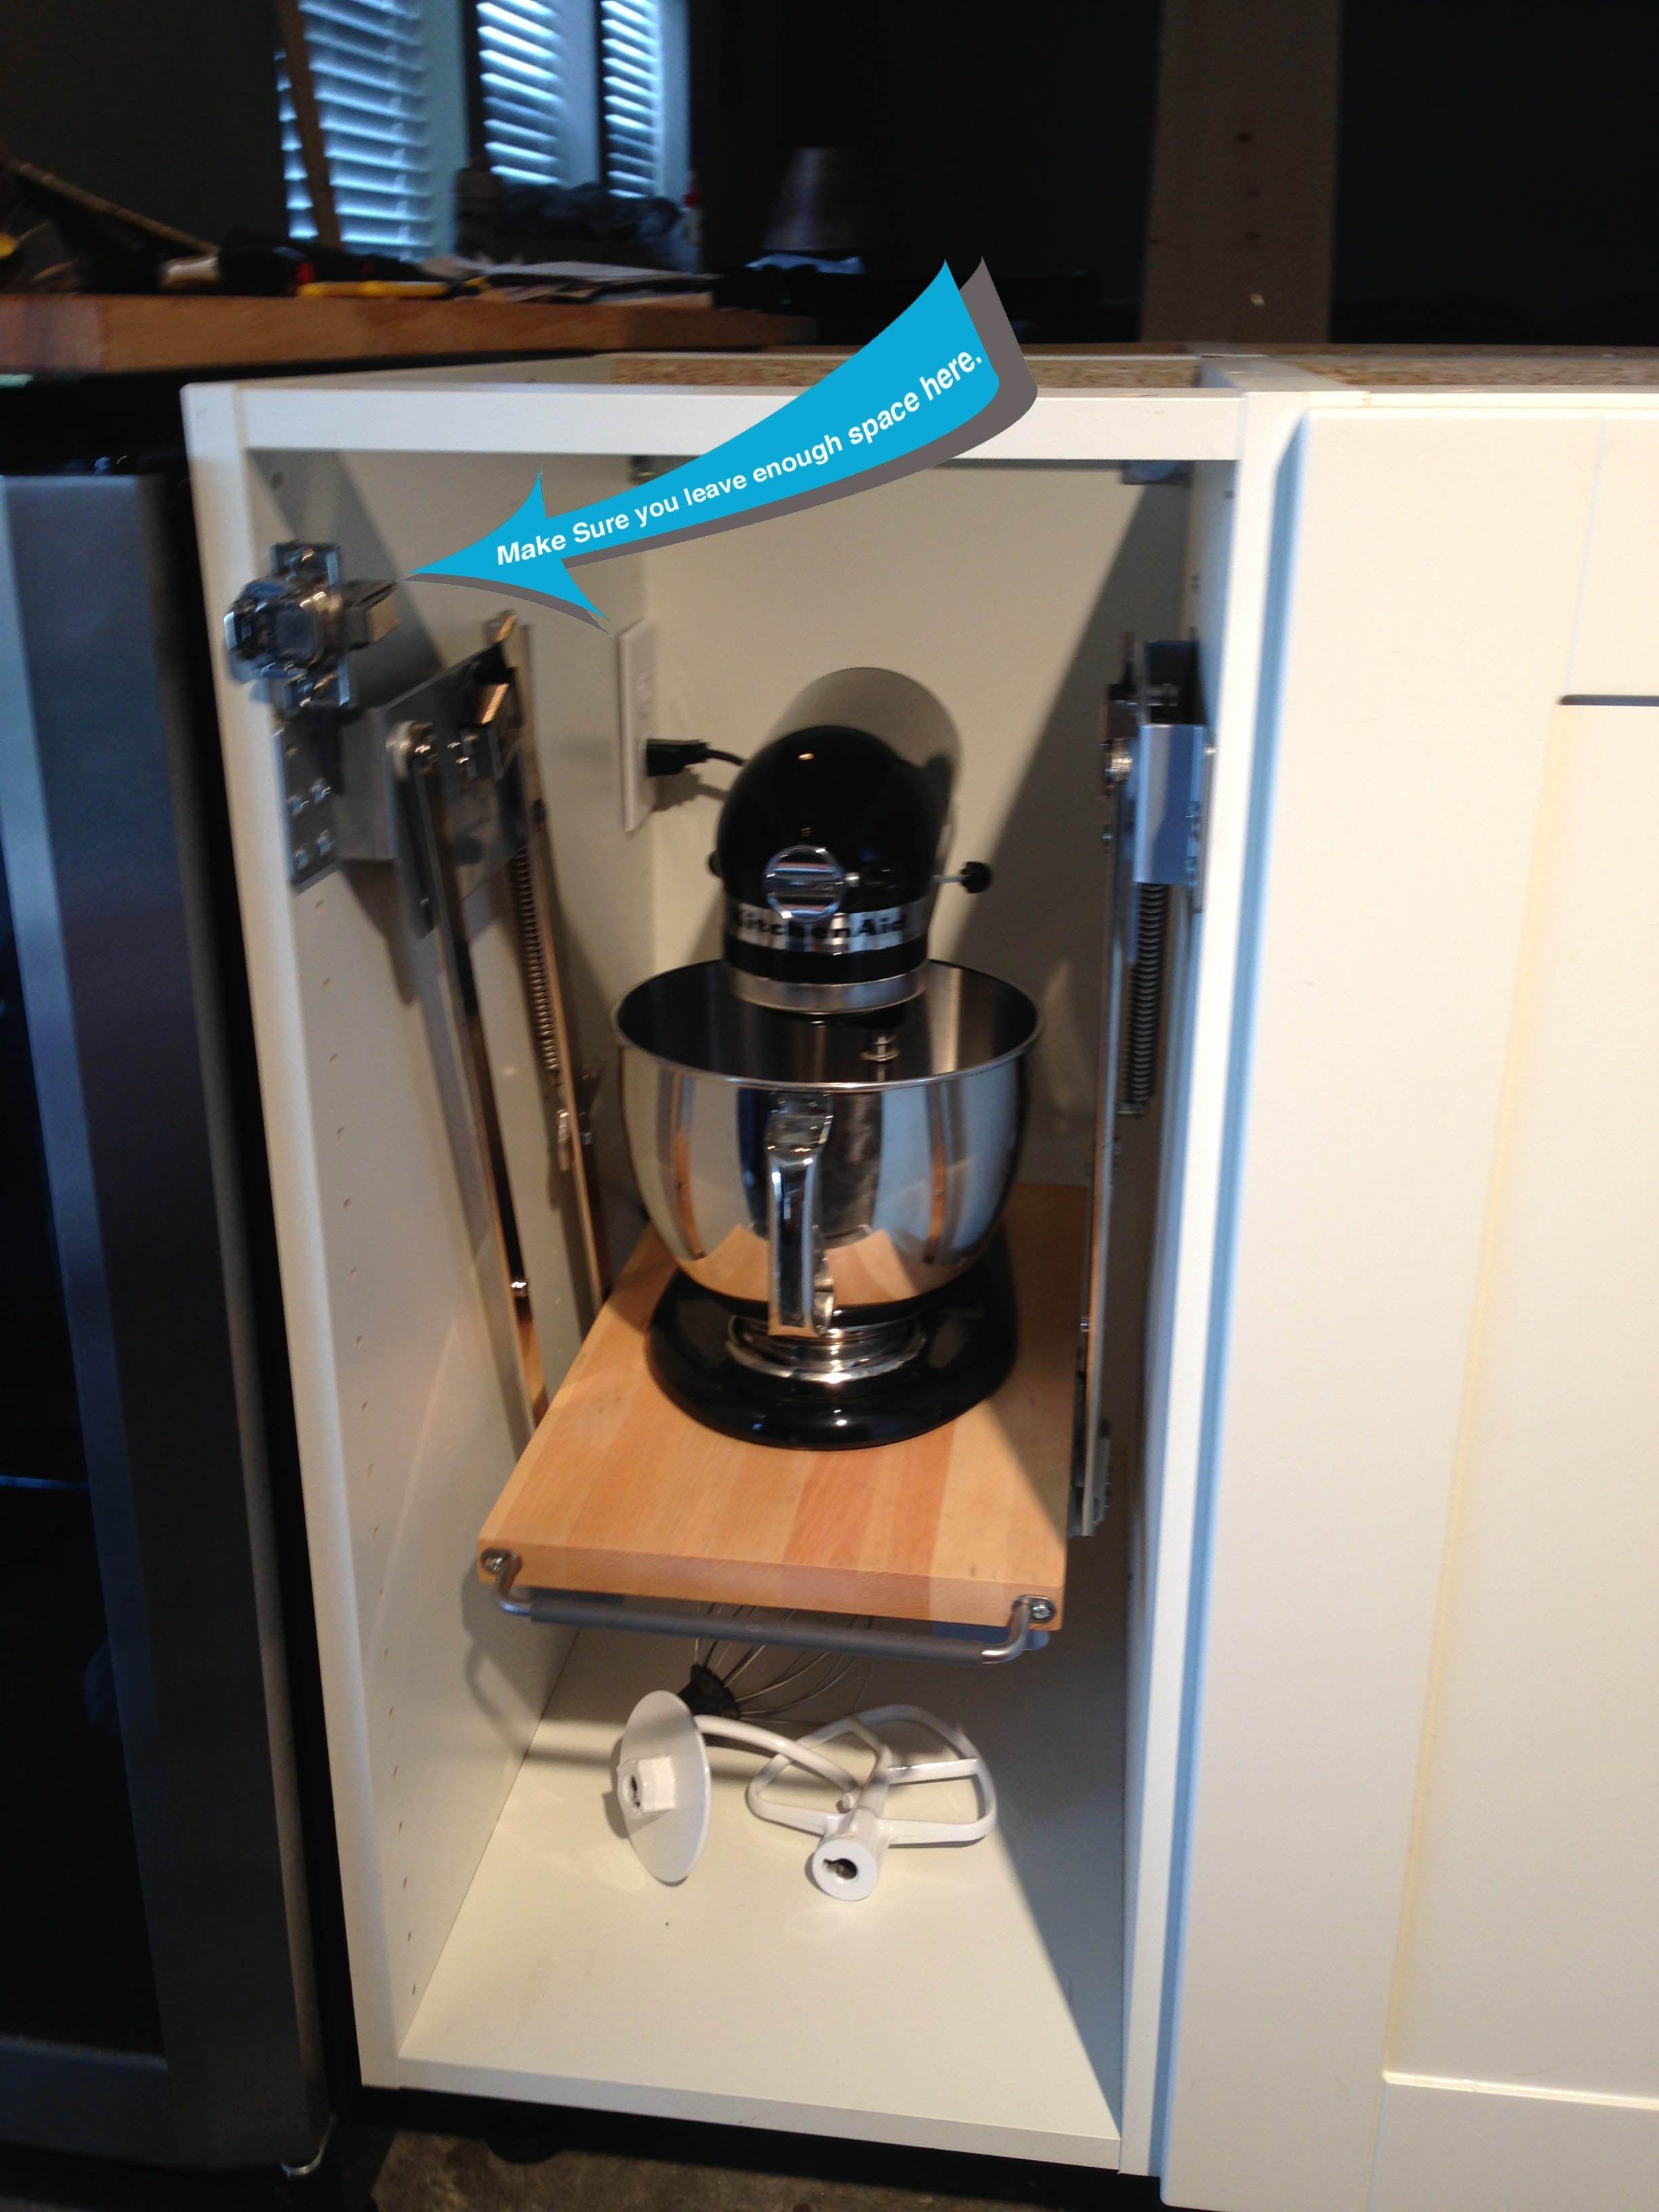 Ikea Cabinets And Mixer Lift Ikea Kitchen Kitchen Remodel Ikea